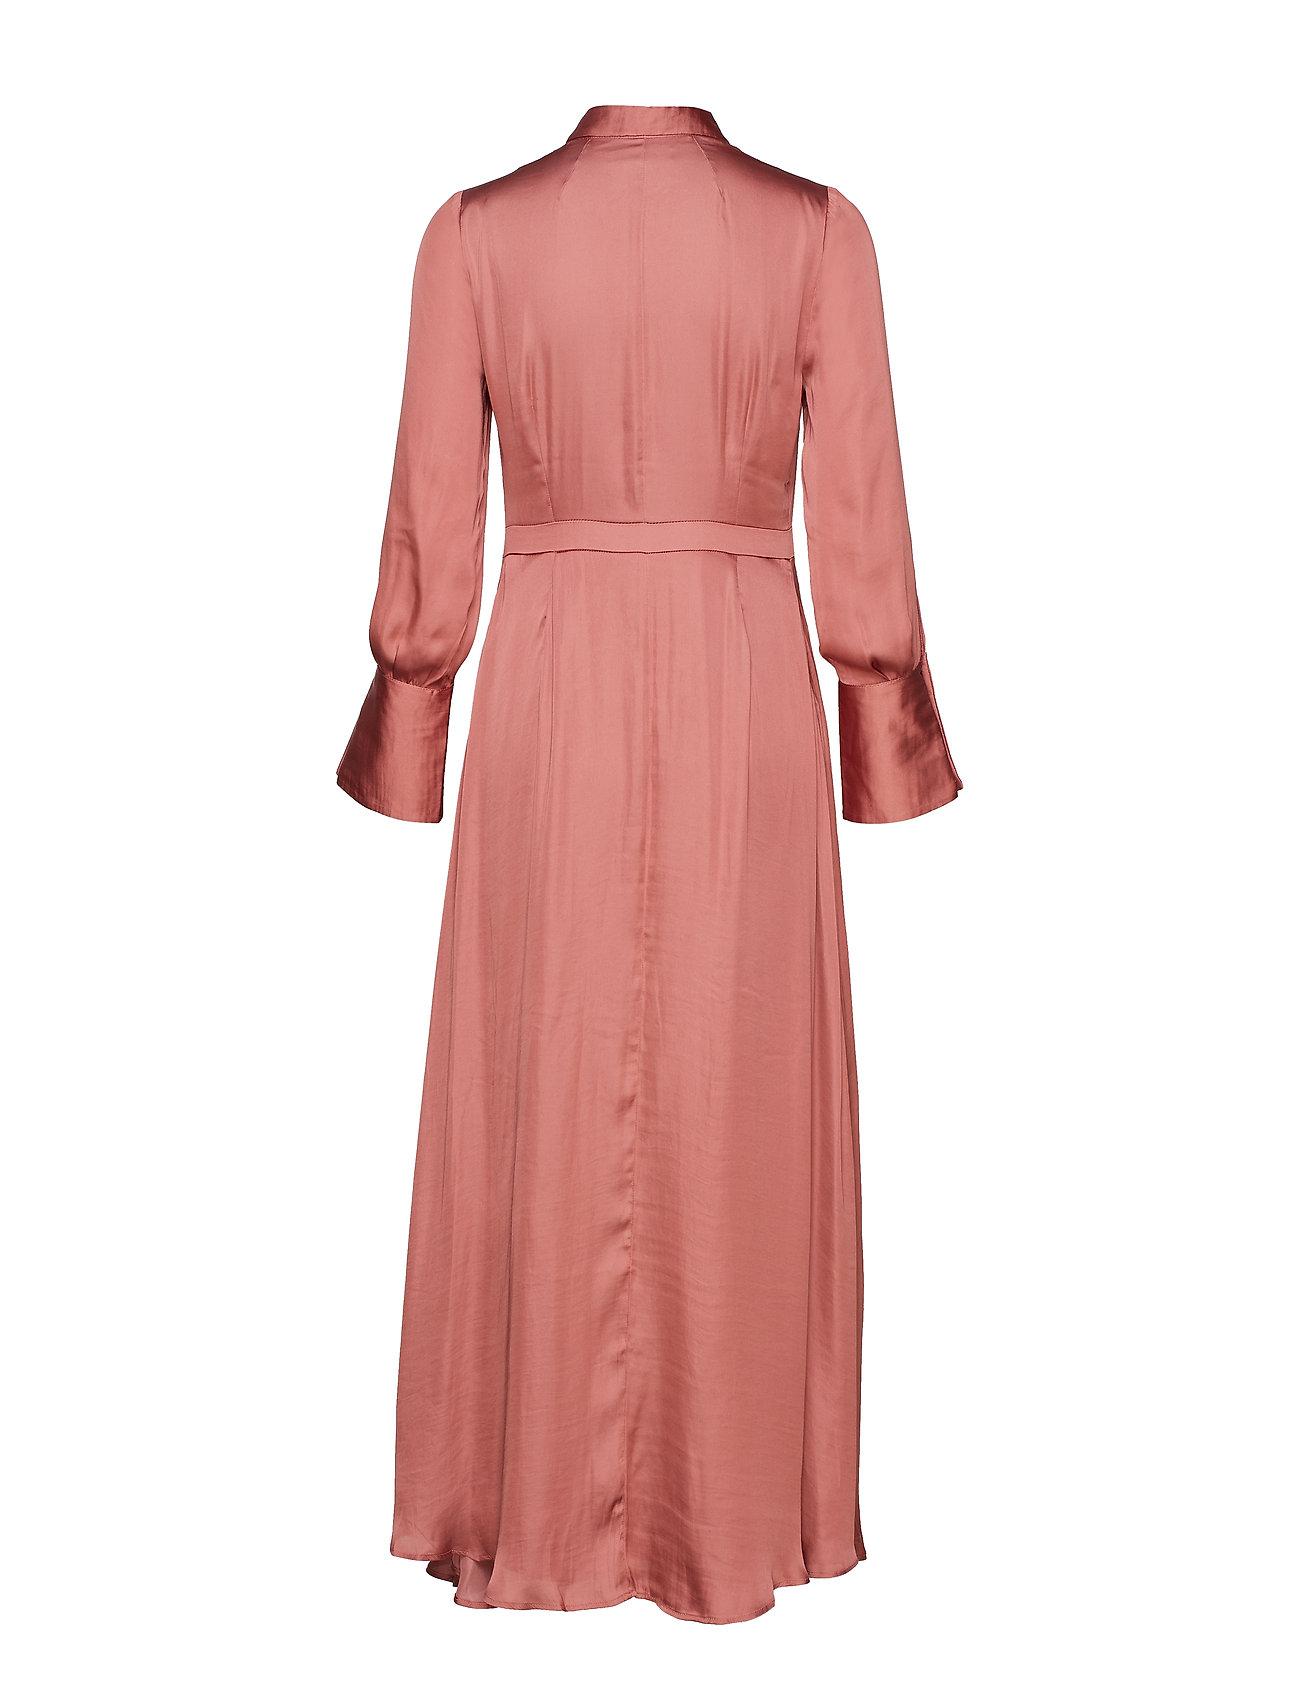 Dress Republic Maxi I RustBanana Savannah Neck Tieburnt W kTPXiOuZ